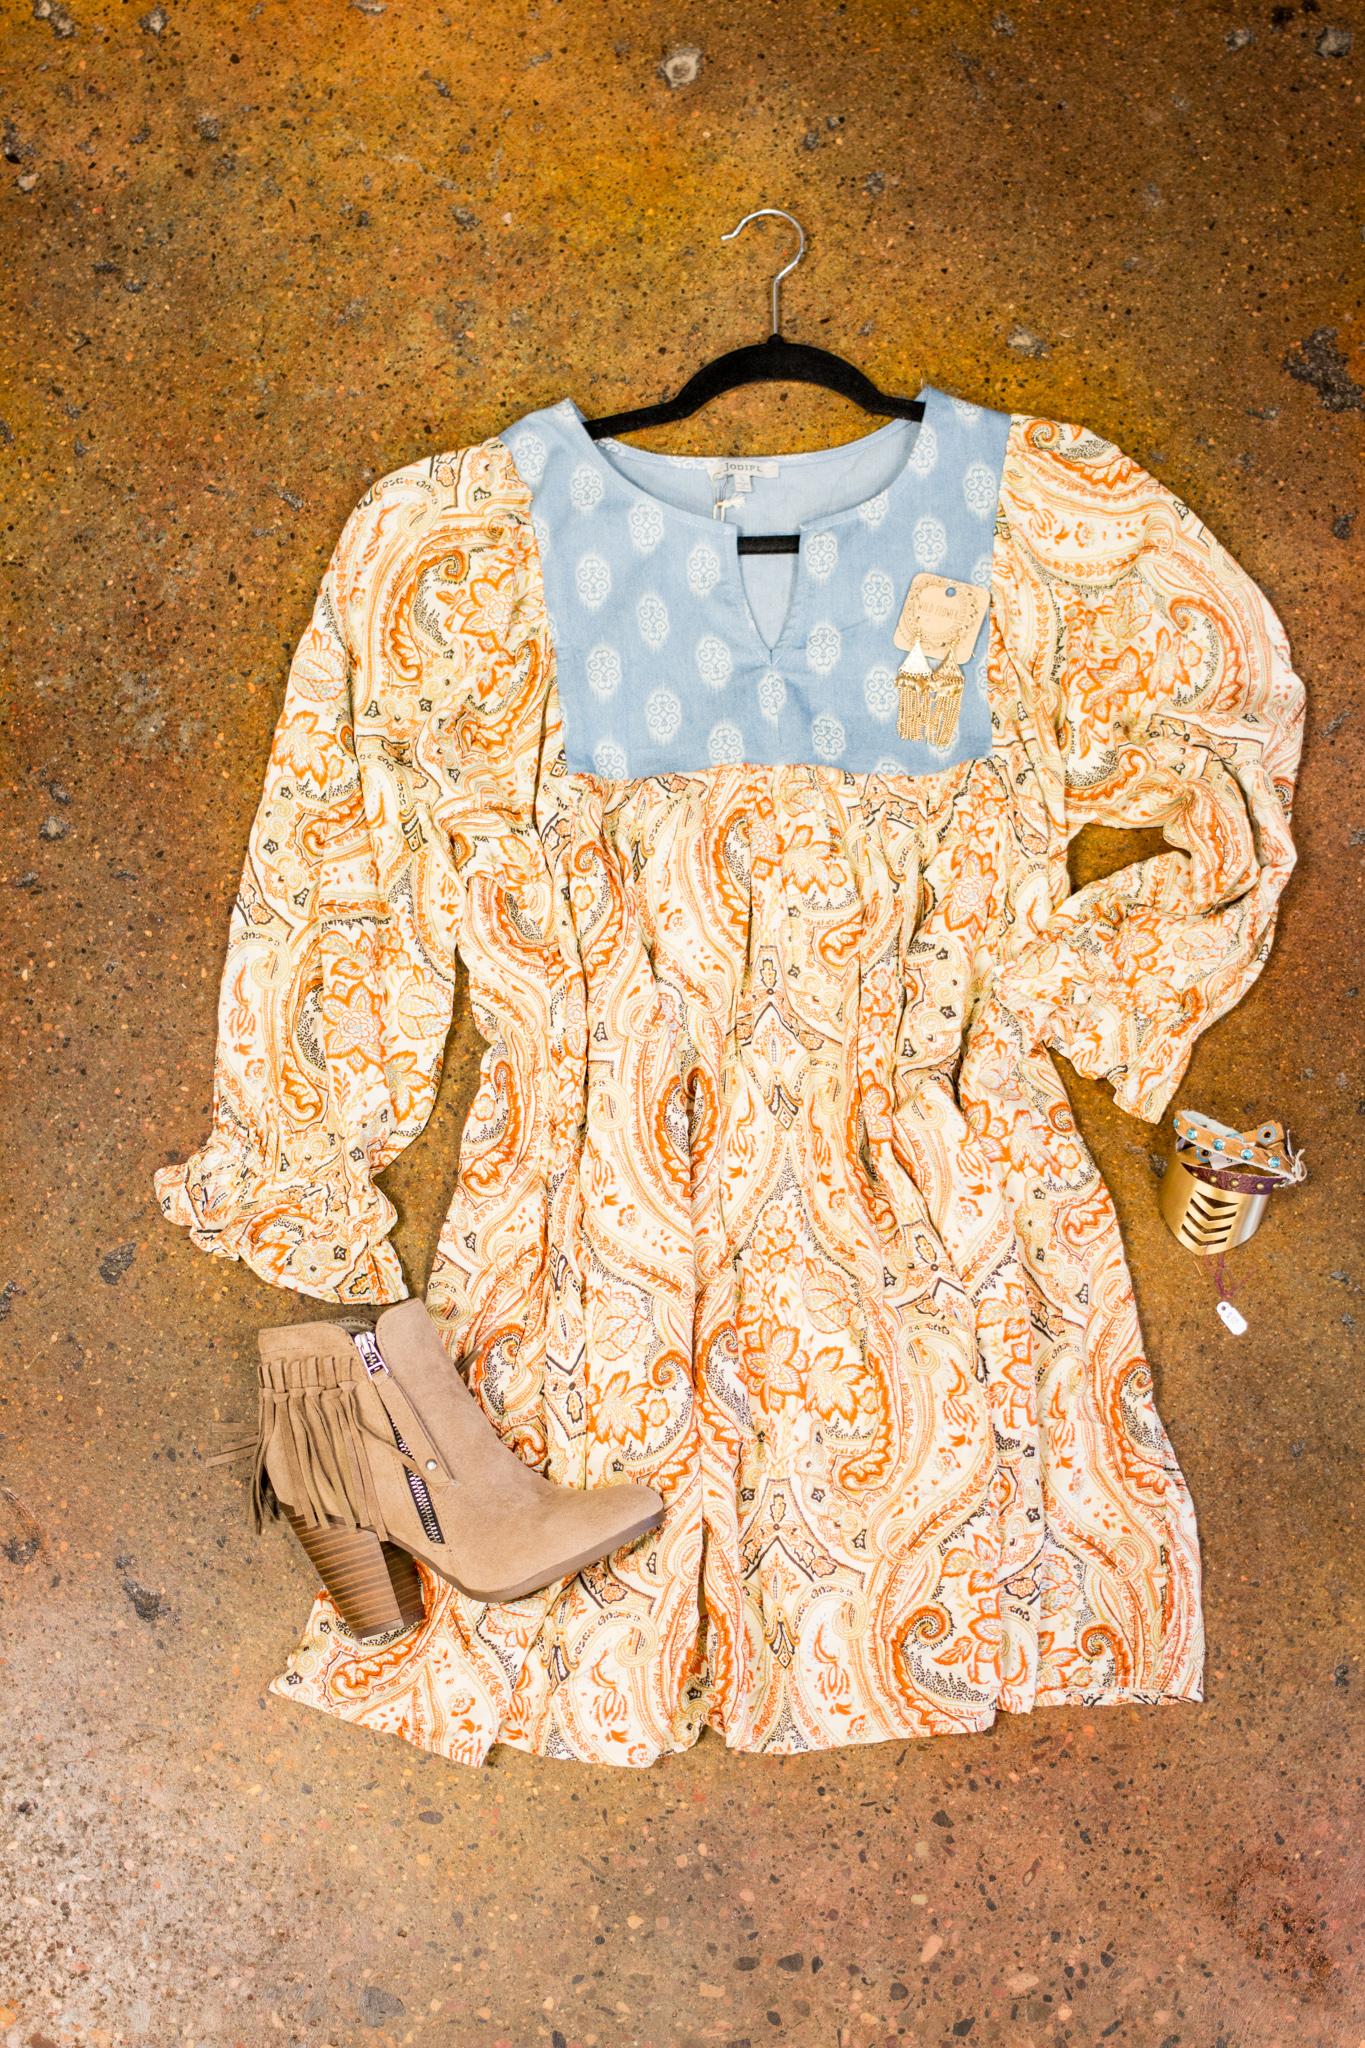 Summer dress to fit every body type. Big Bratt Boutique, Spanish Fork Utah